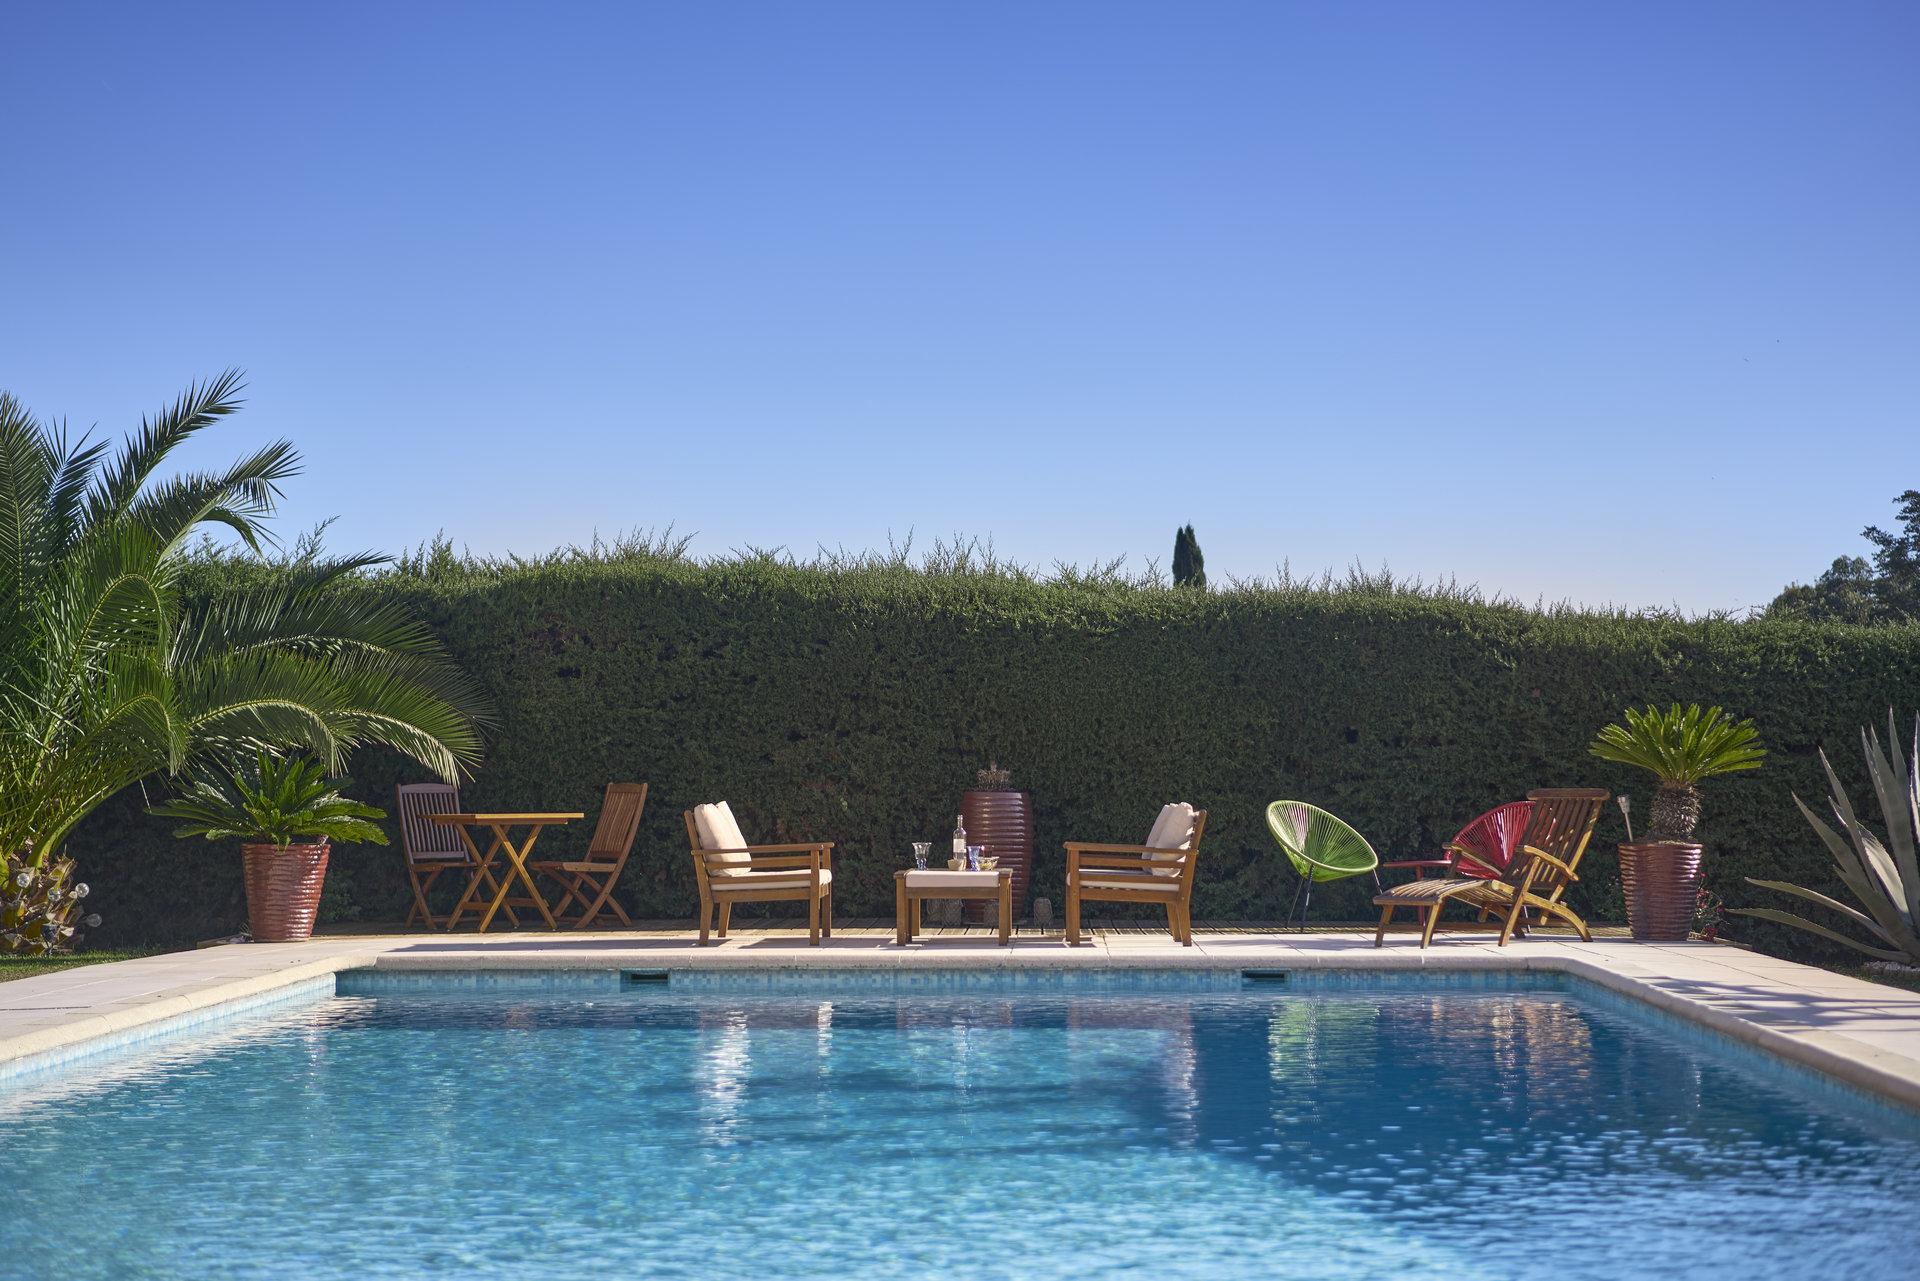 Vendita Villa - Antibes Antibes-les-Pins - Francia